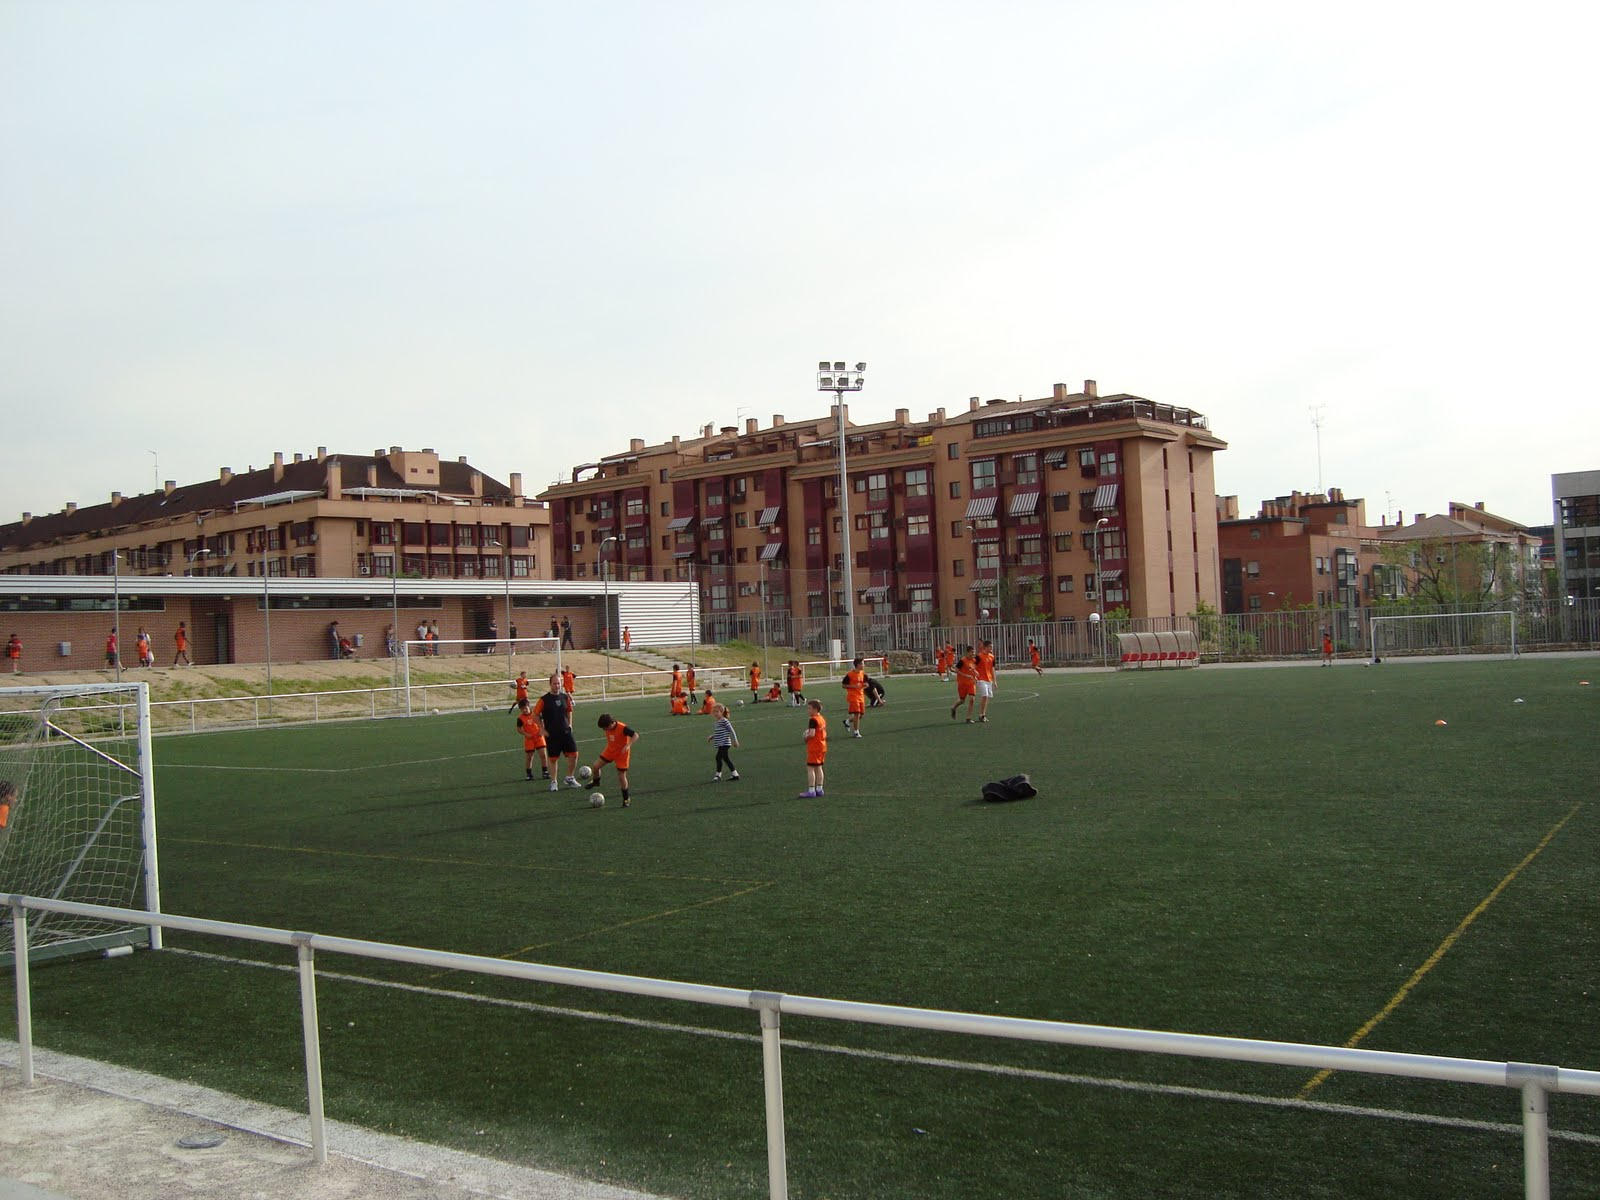 El entorno del joaqu n costa centro deportivo municipal for Piscina municipal arganzuela